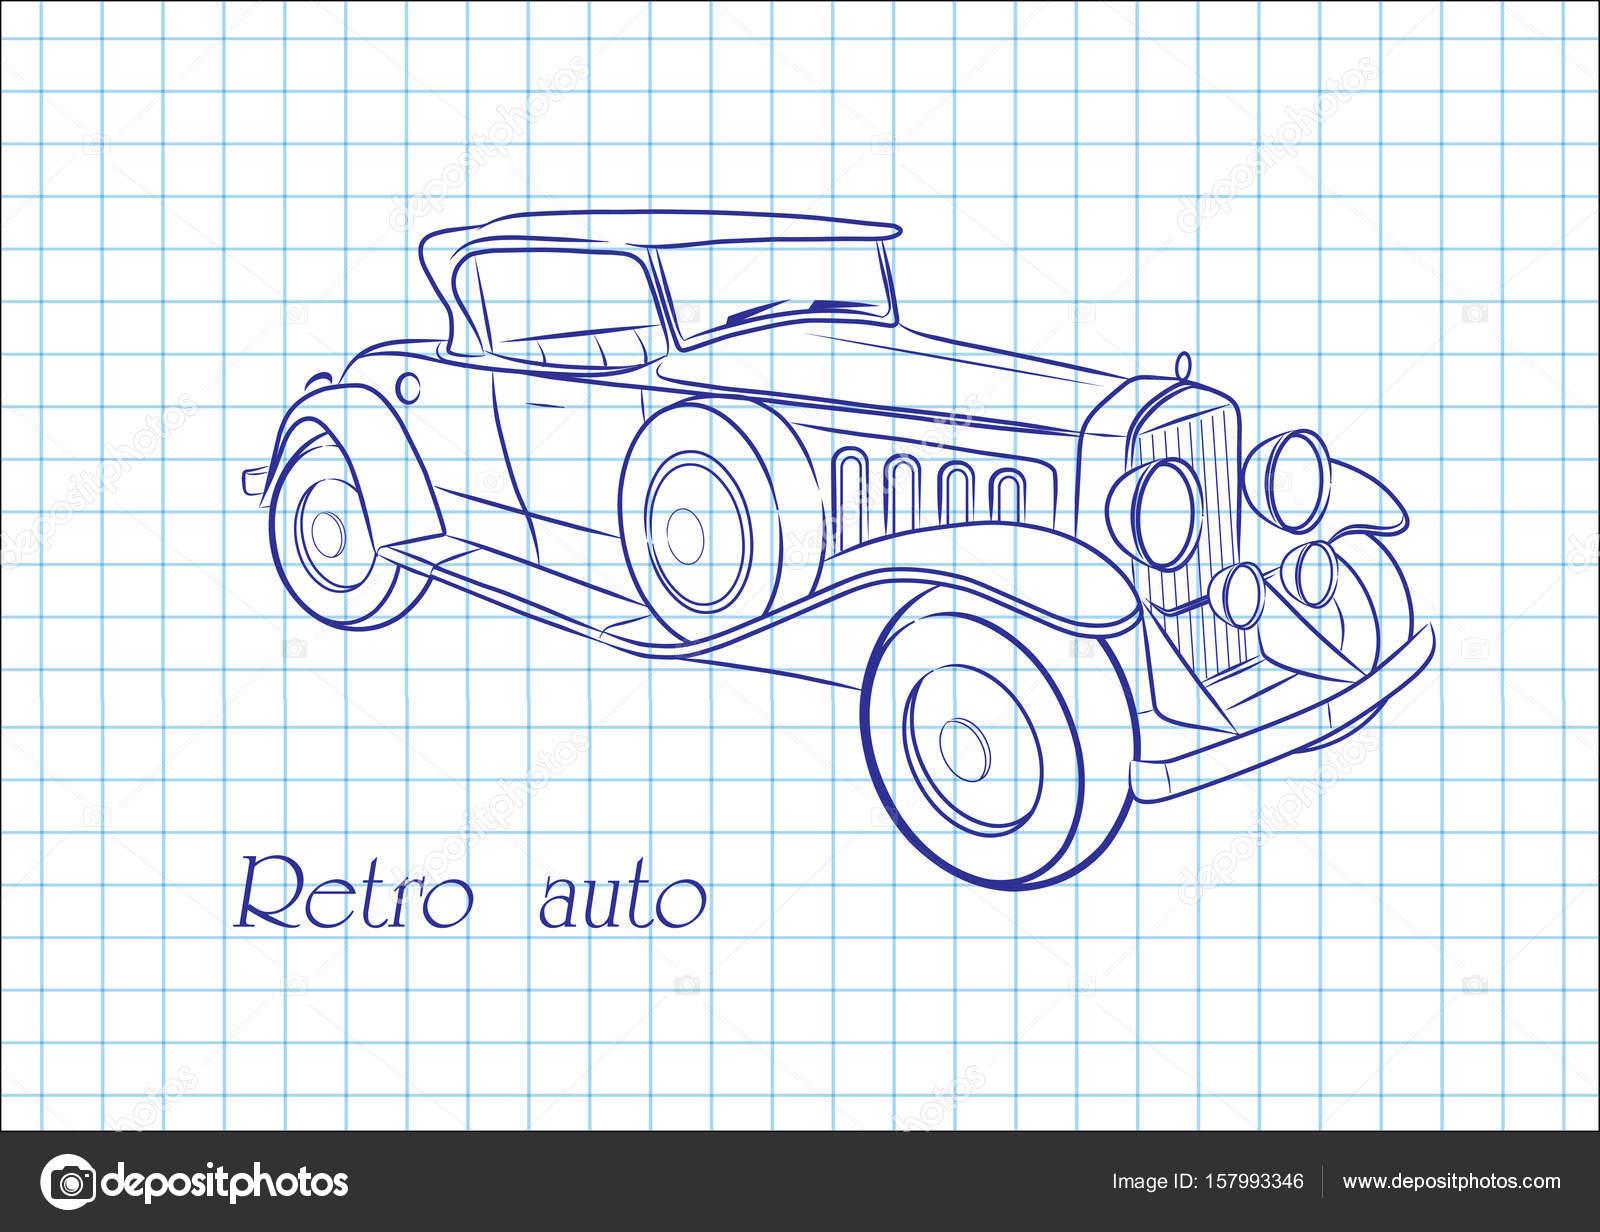 Retro Auto Skizze — Stockvektor © Aleks49011 #157993346